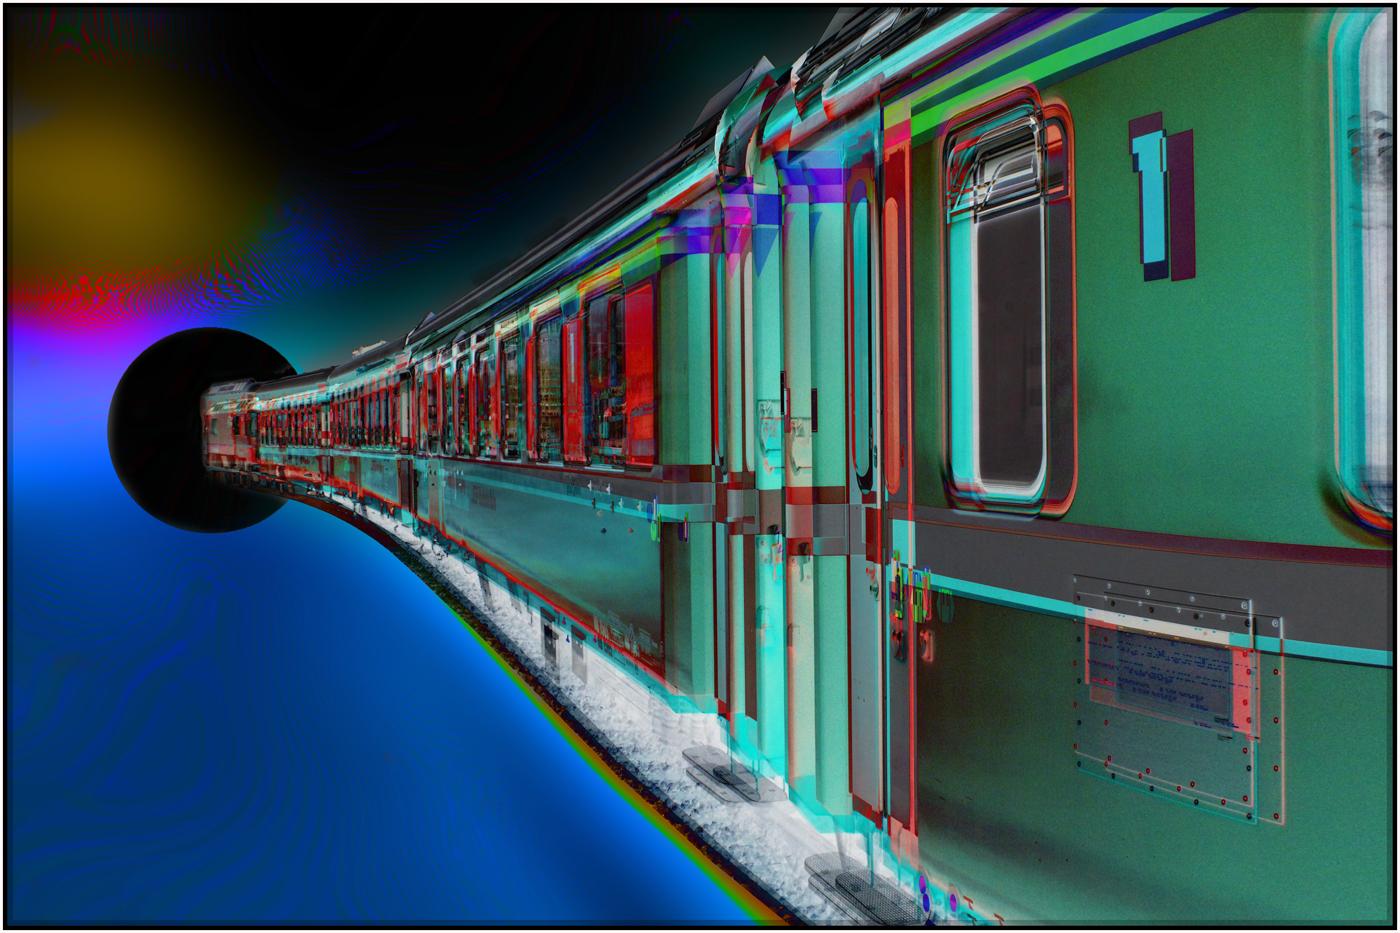 roberta houston - Time Tunnel